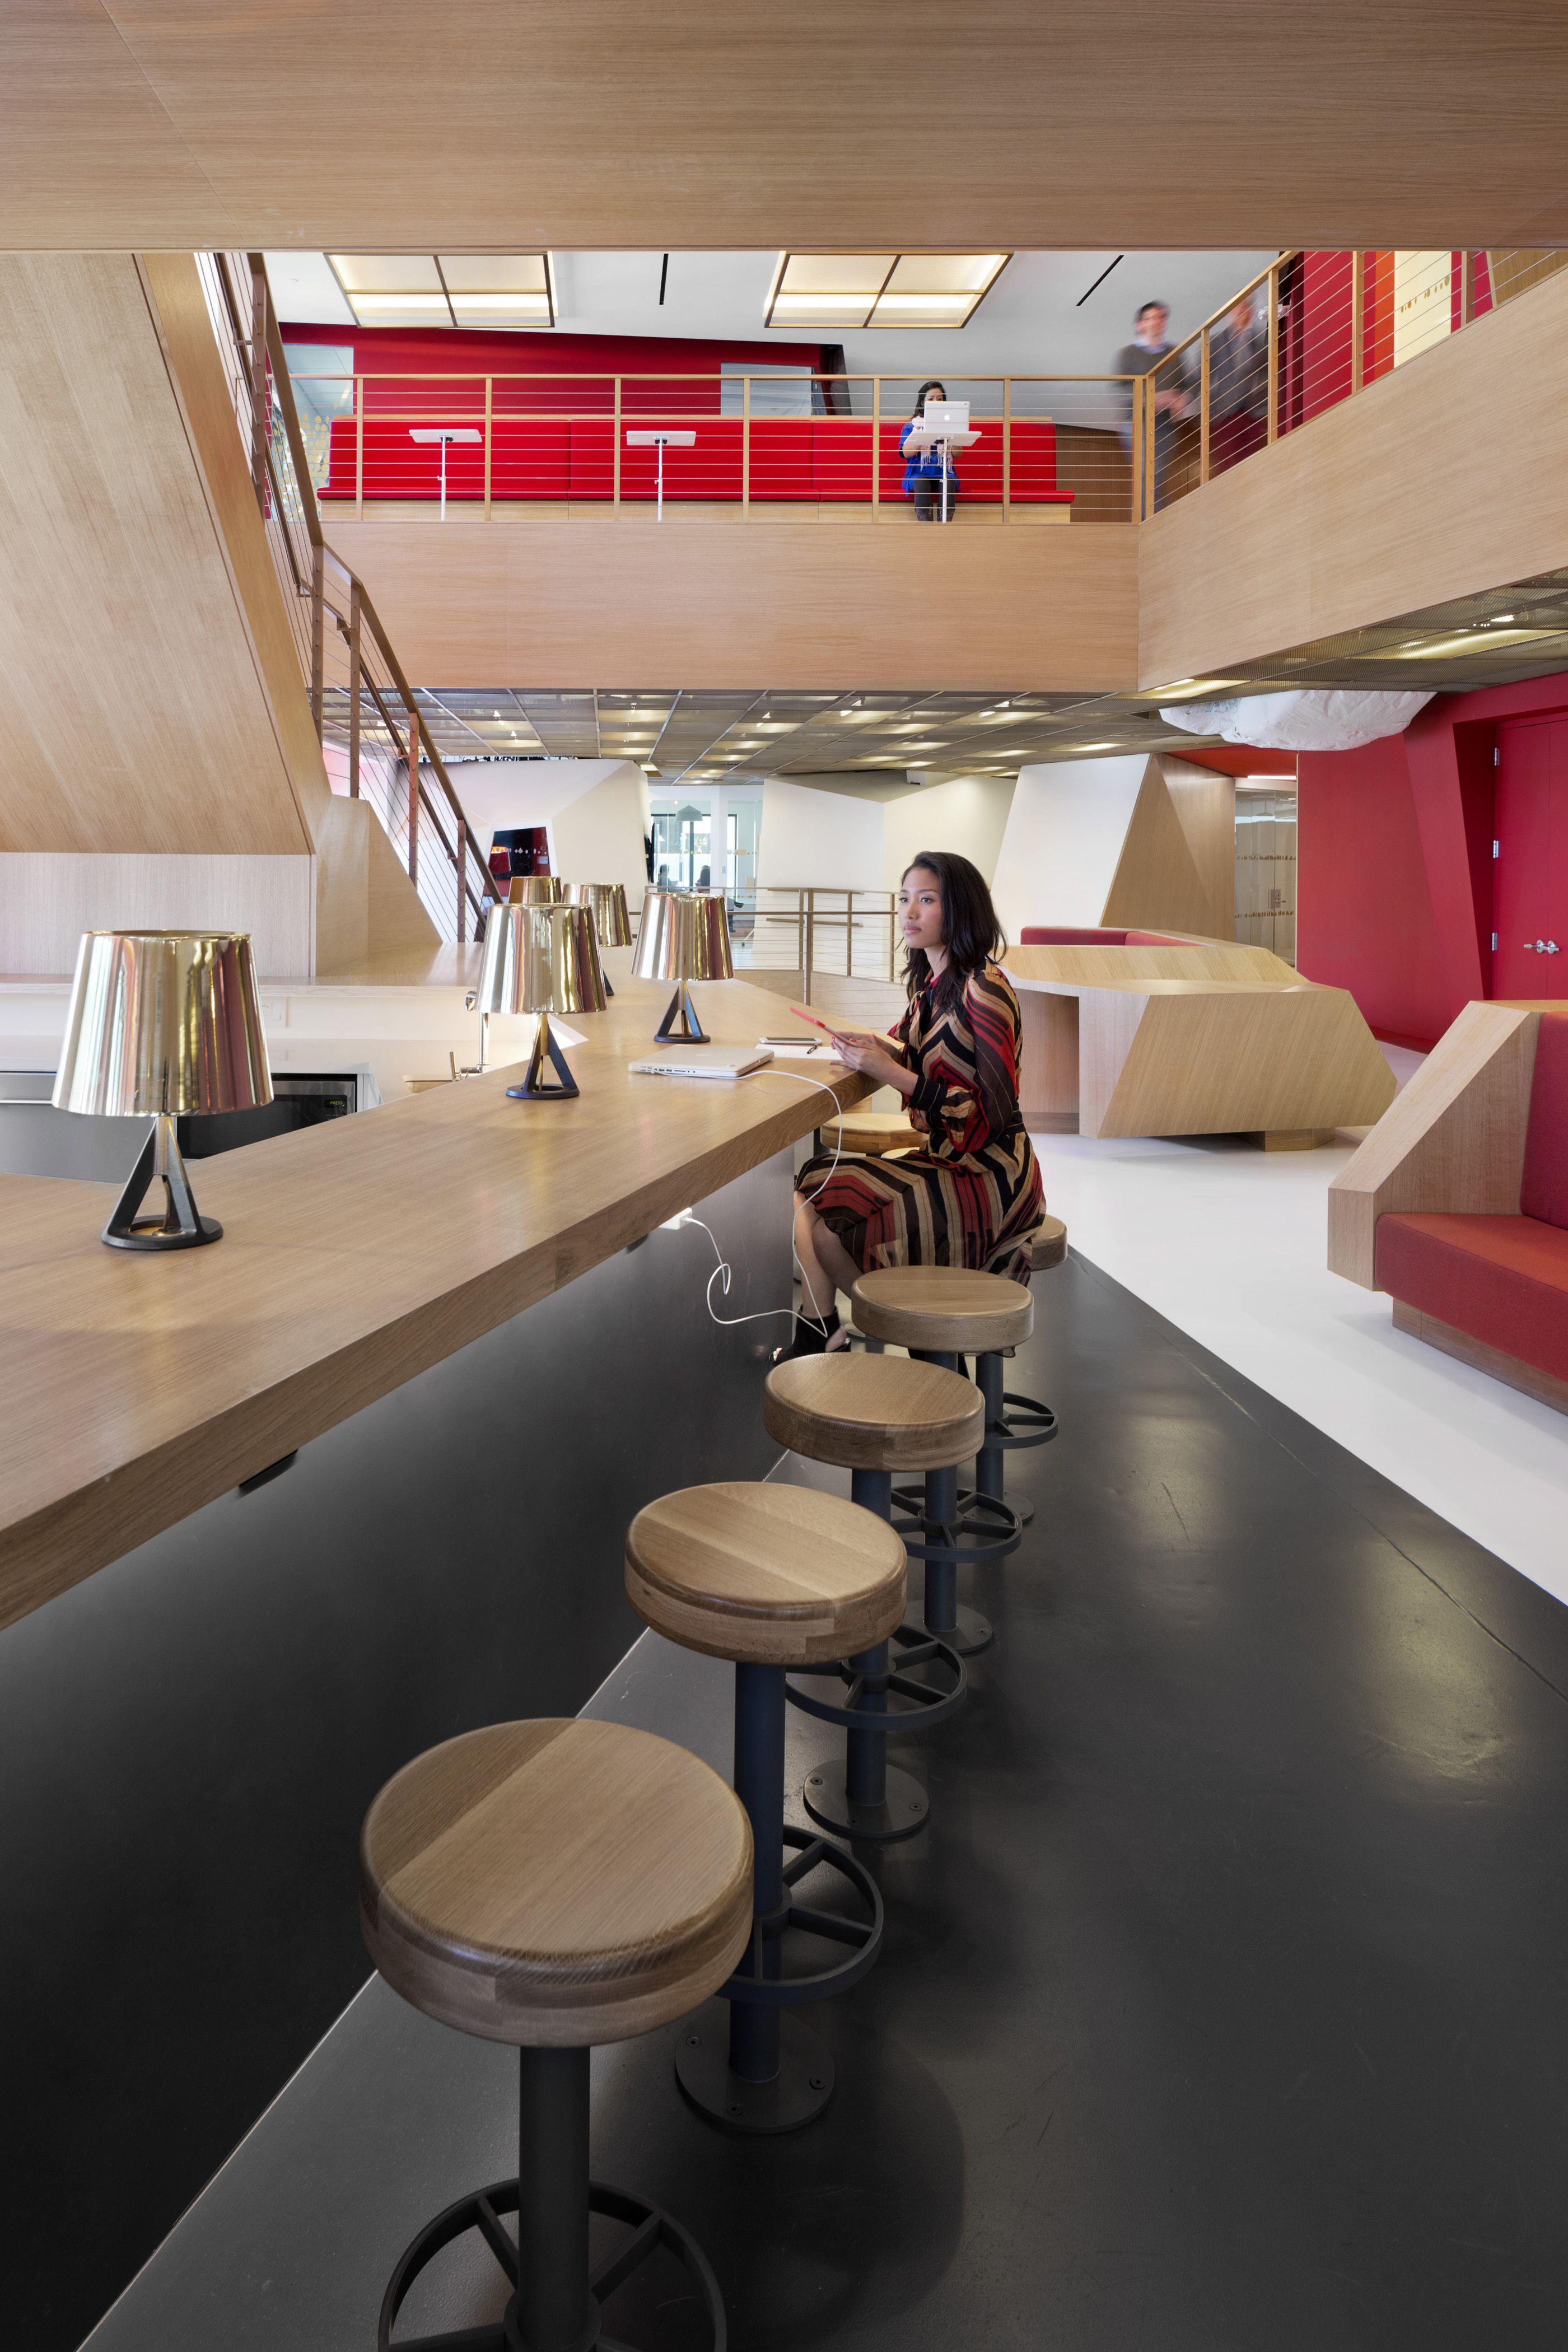 Clive wilkinson architects publicis north american headquarters interior work best interior office interior